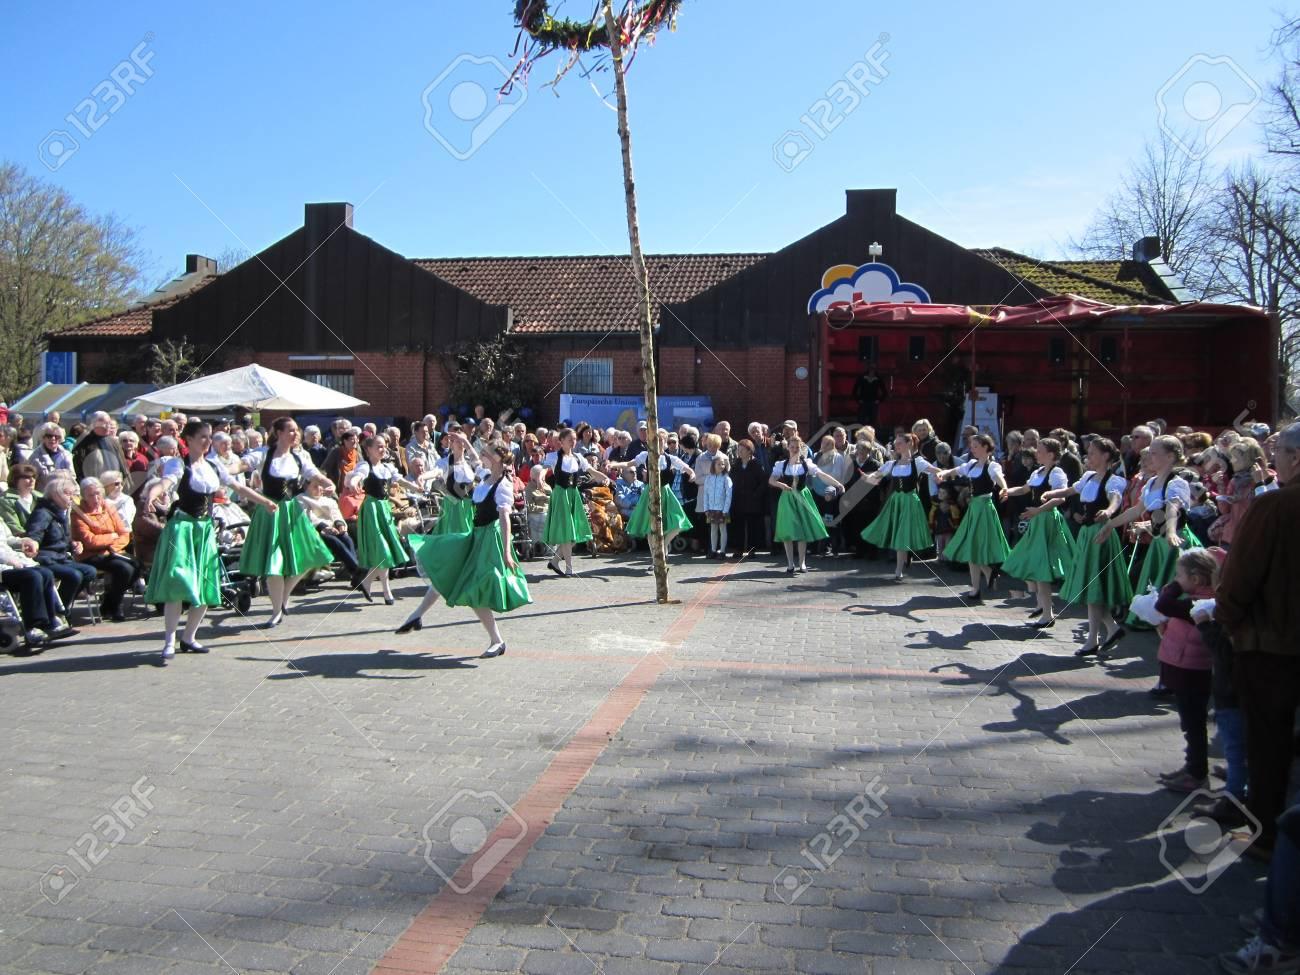 Dancing around the maypole Stock Photo - 24048086